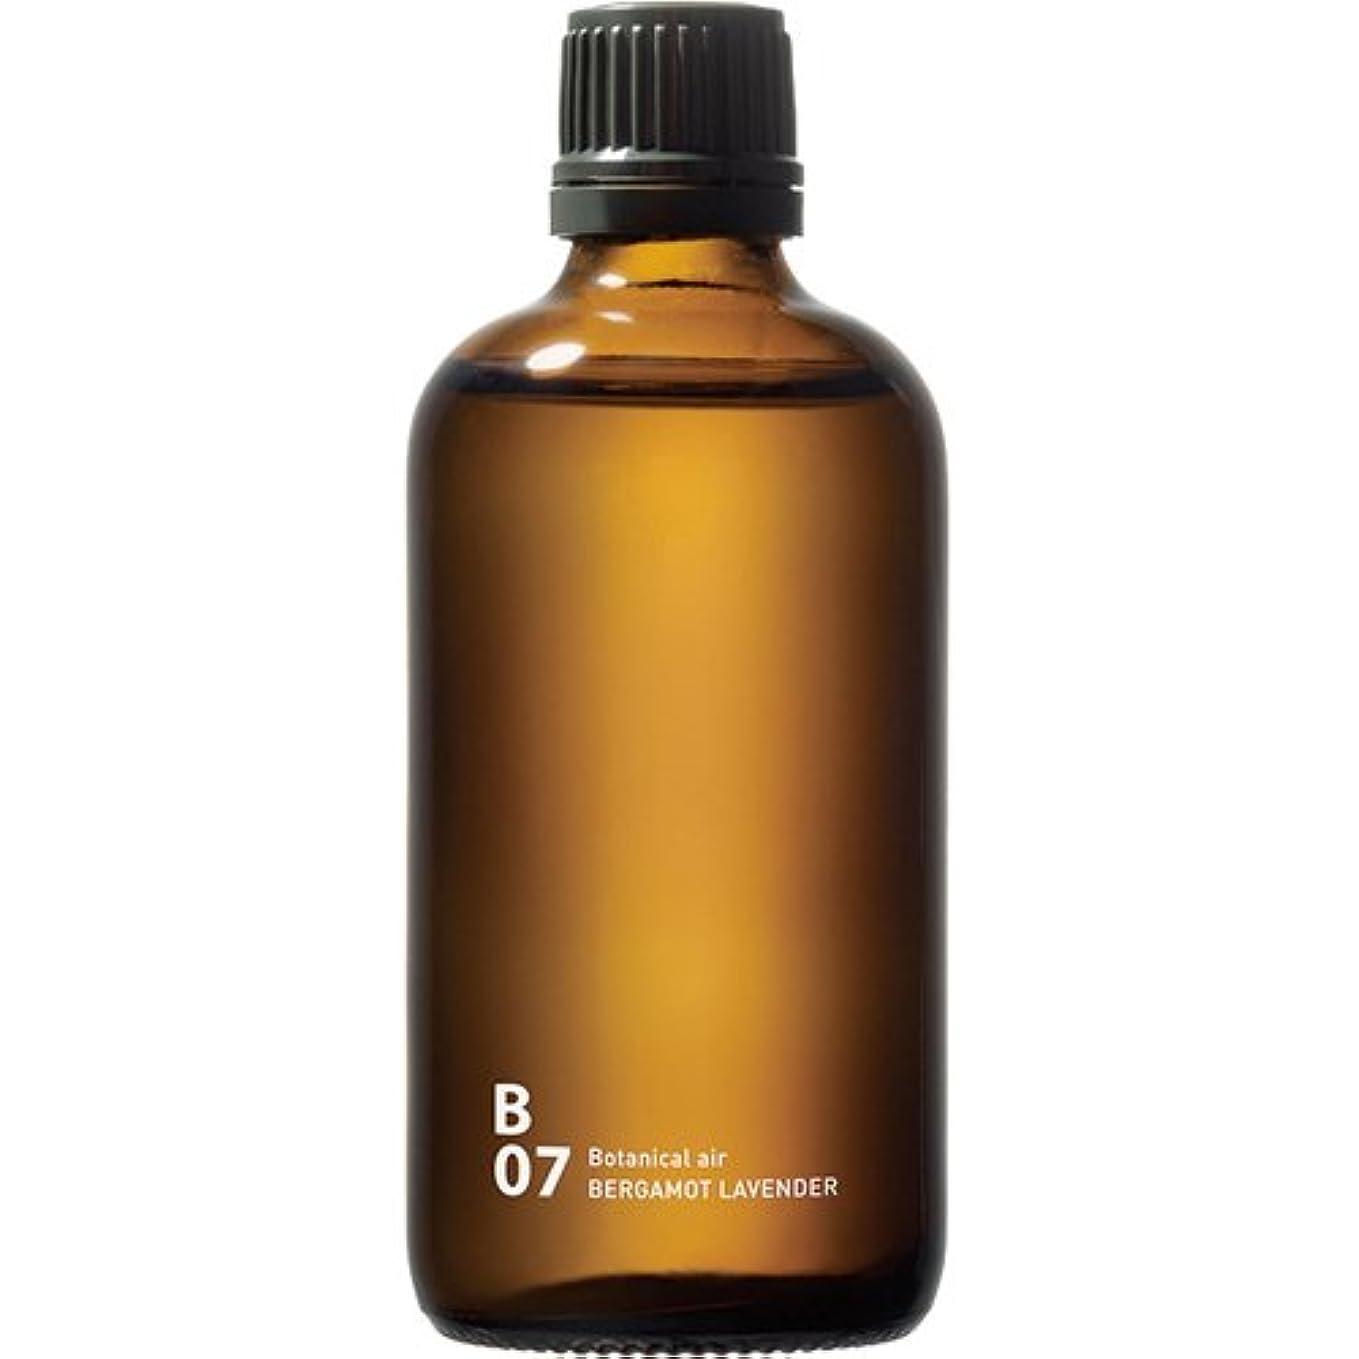 逸脱最後に兵士B07 BERGAMOT LAVENDER piezo aroma oil 100ml